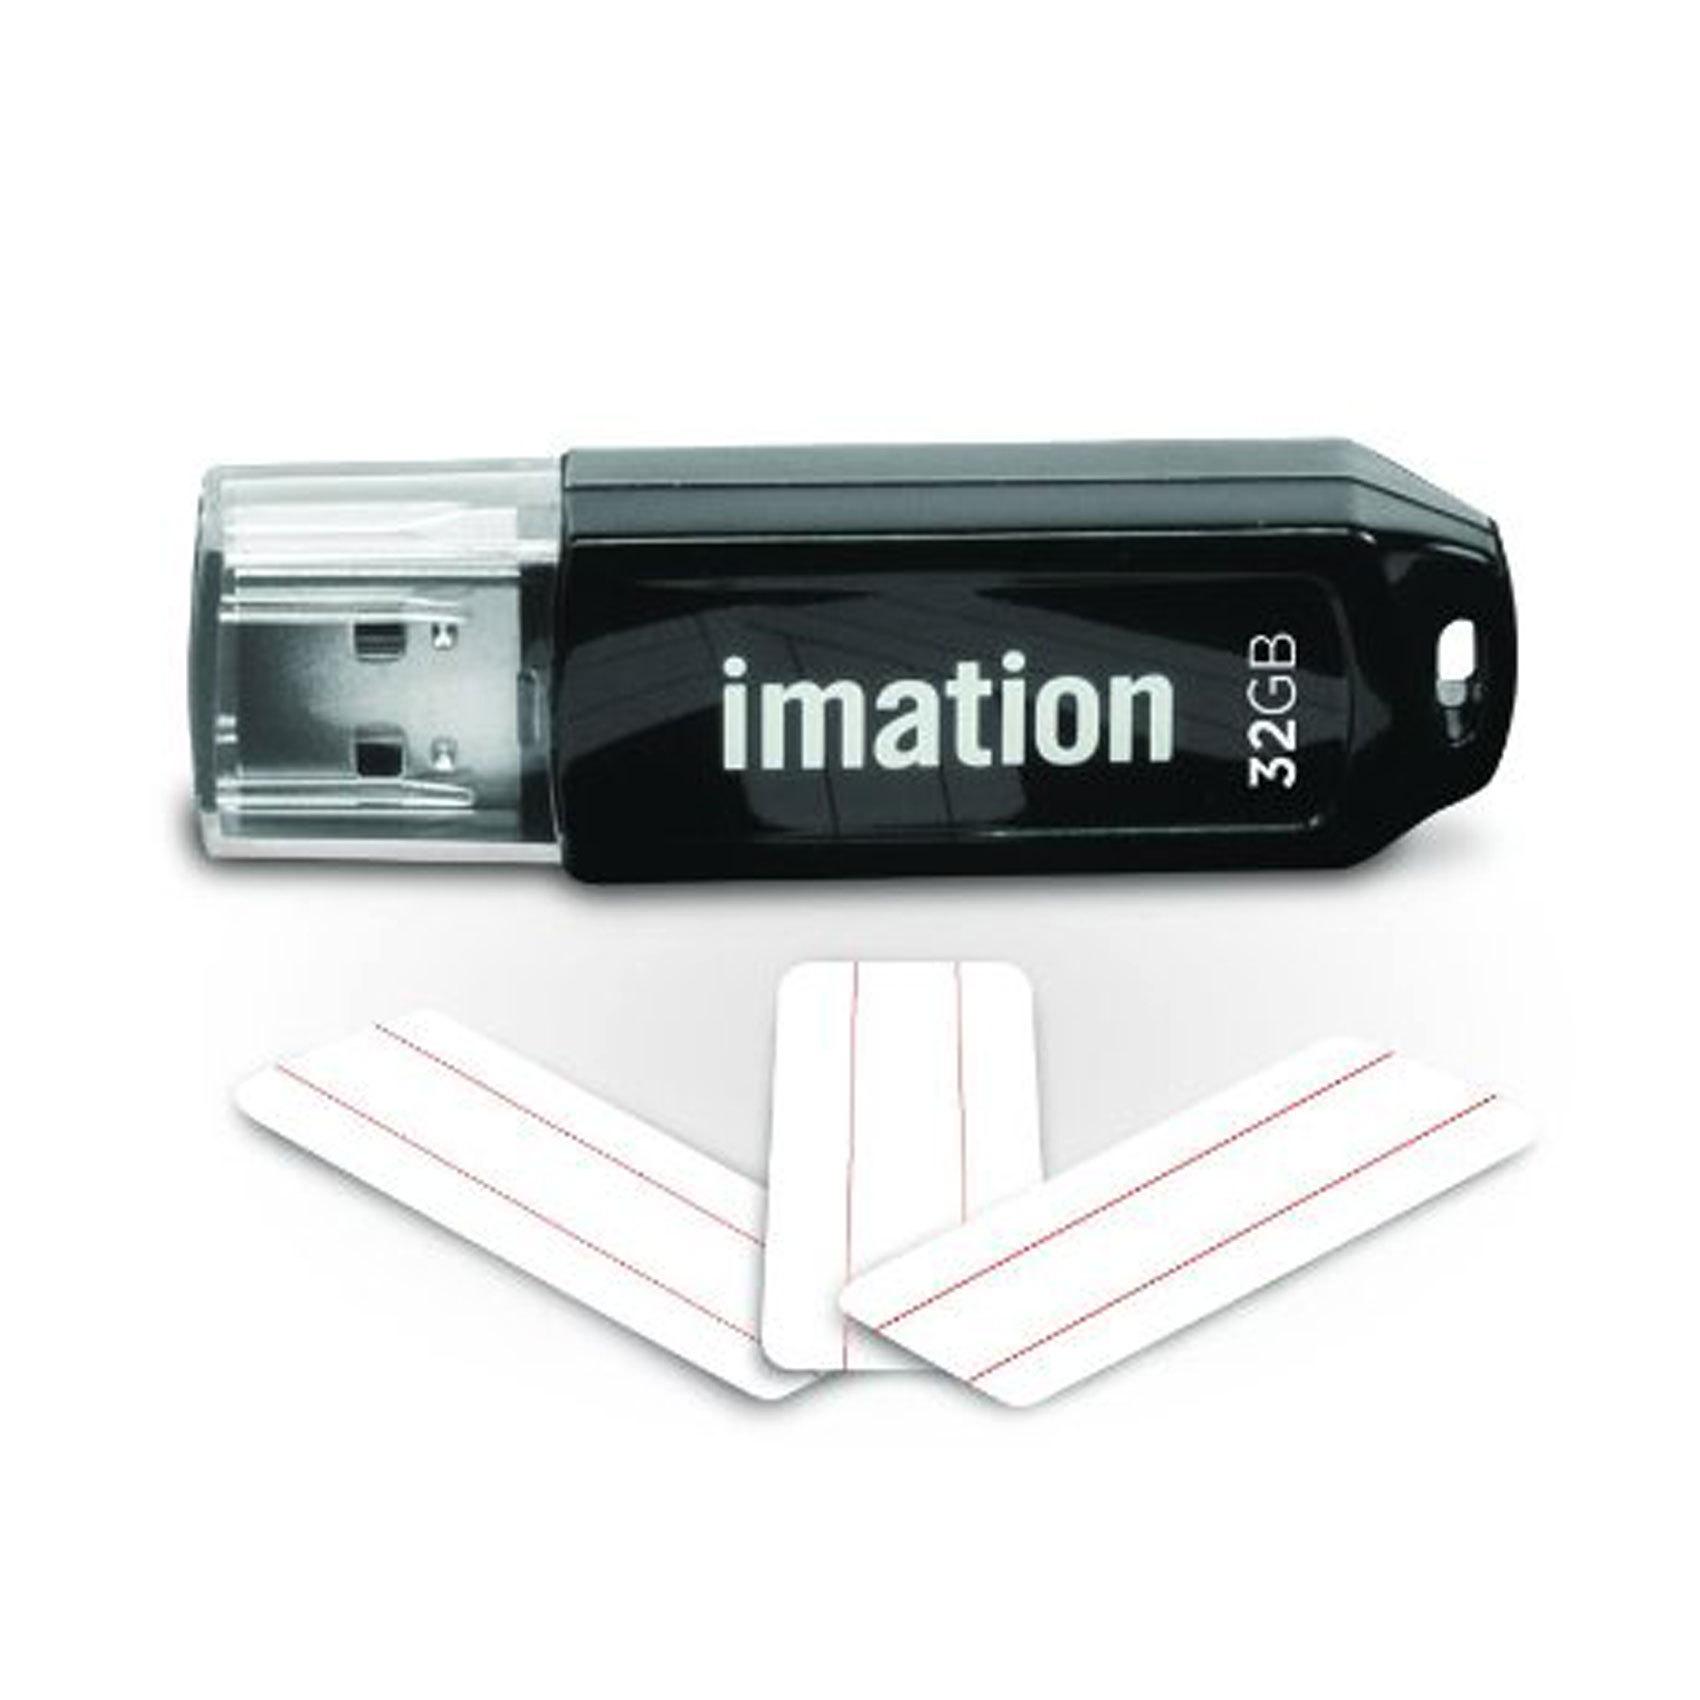 IMATION USB F/D 32GB POCKET